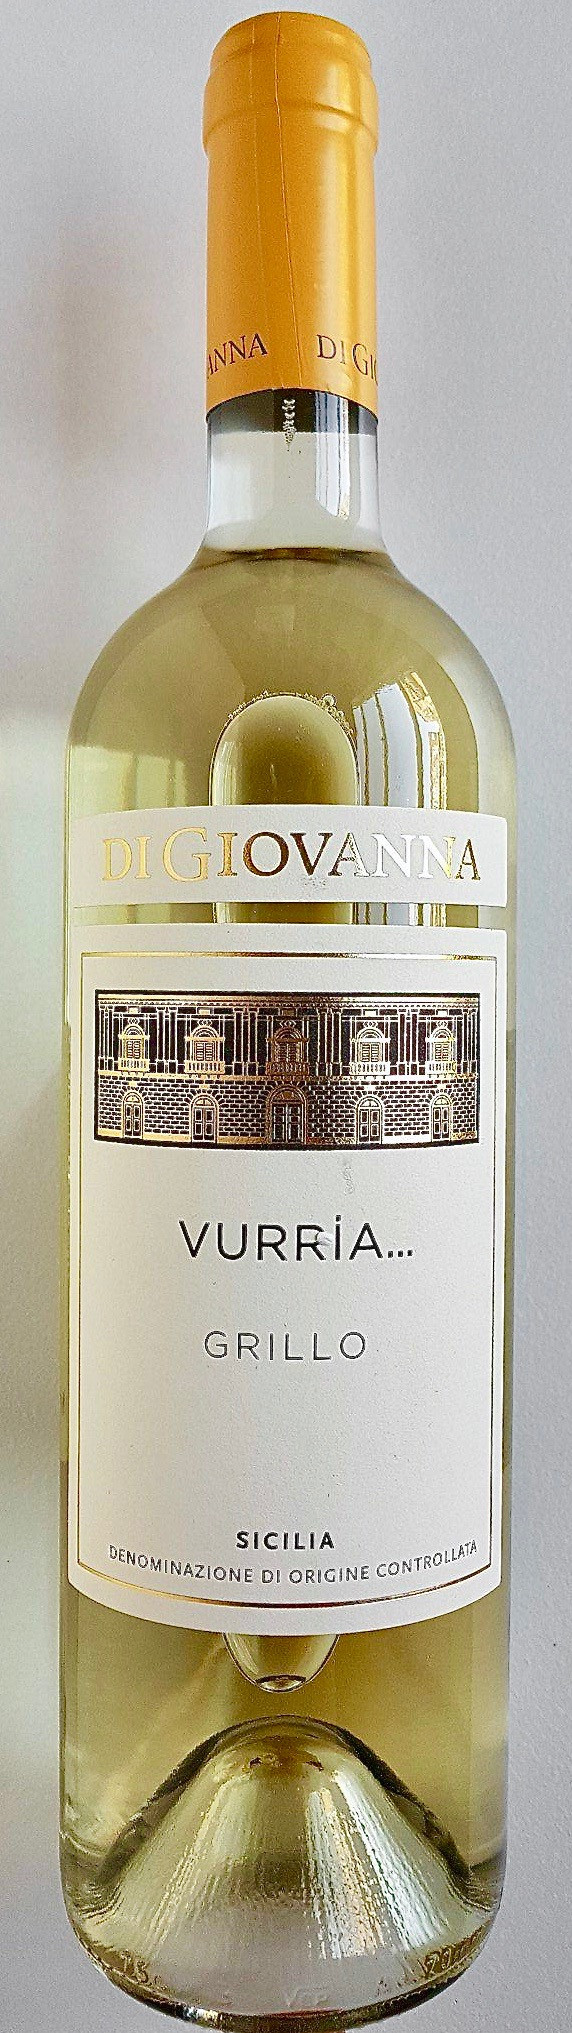 Di Giovanna vegan wine